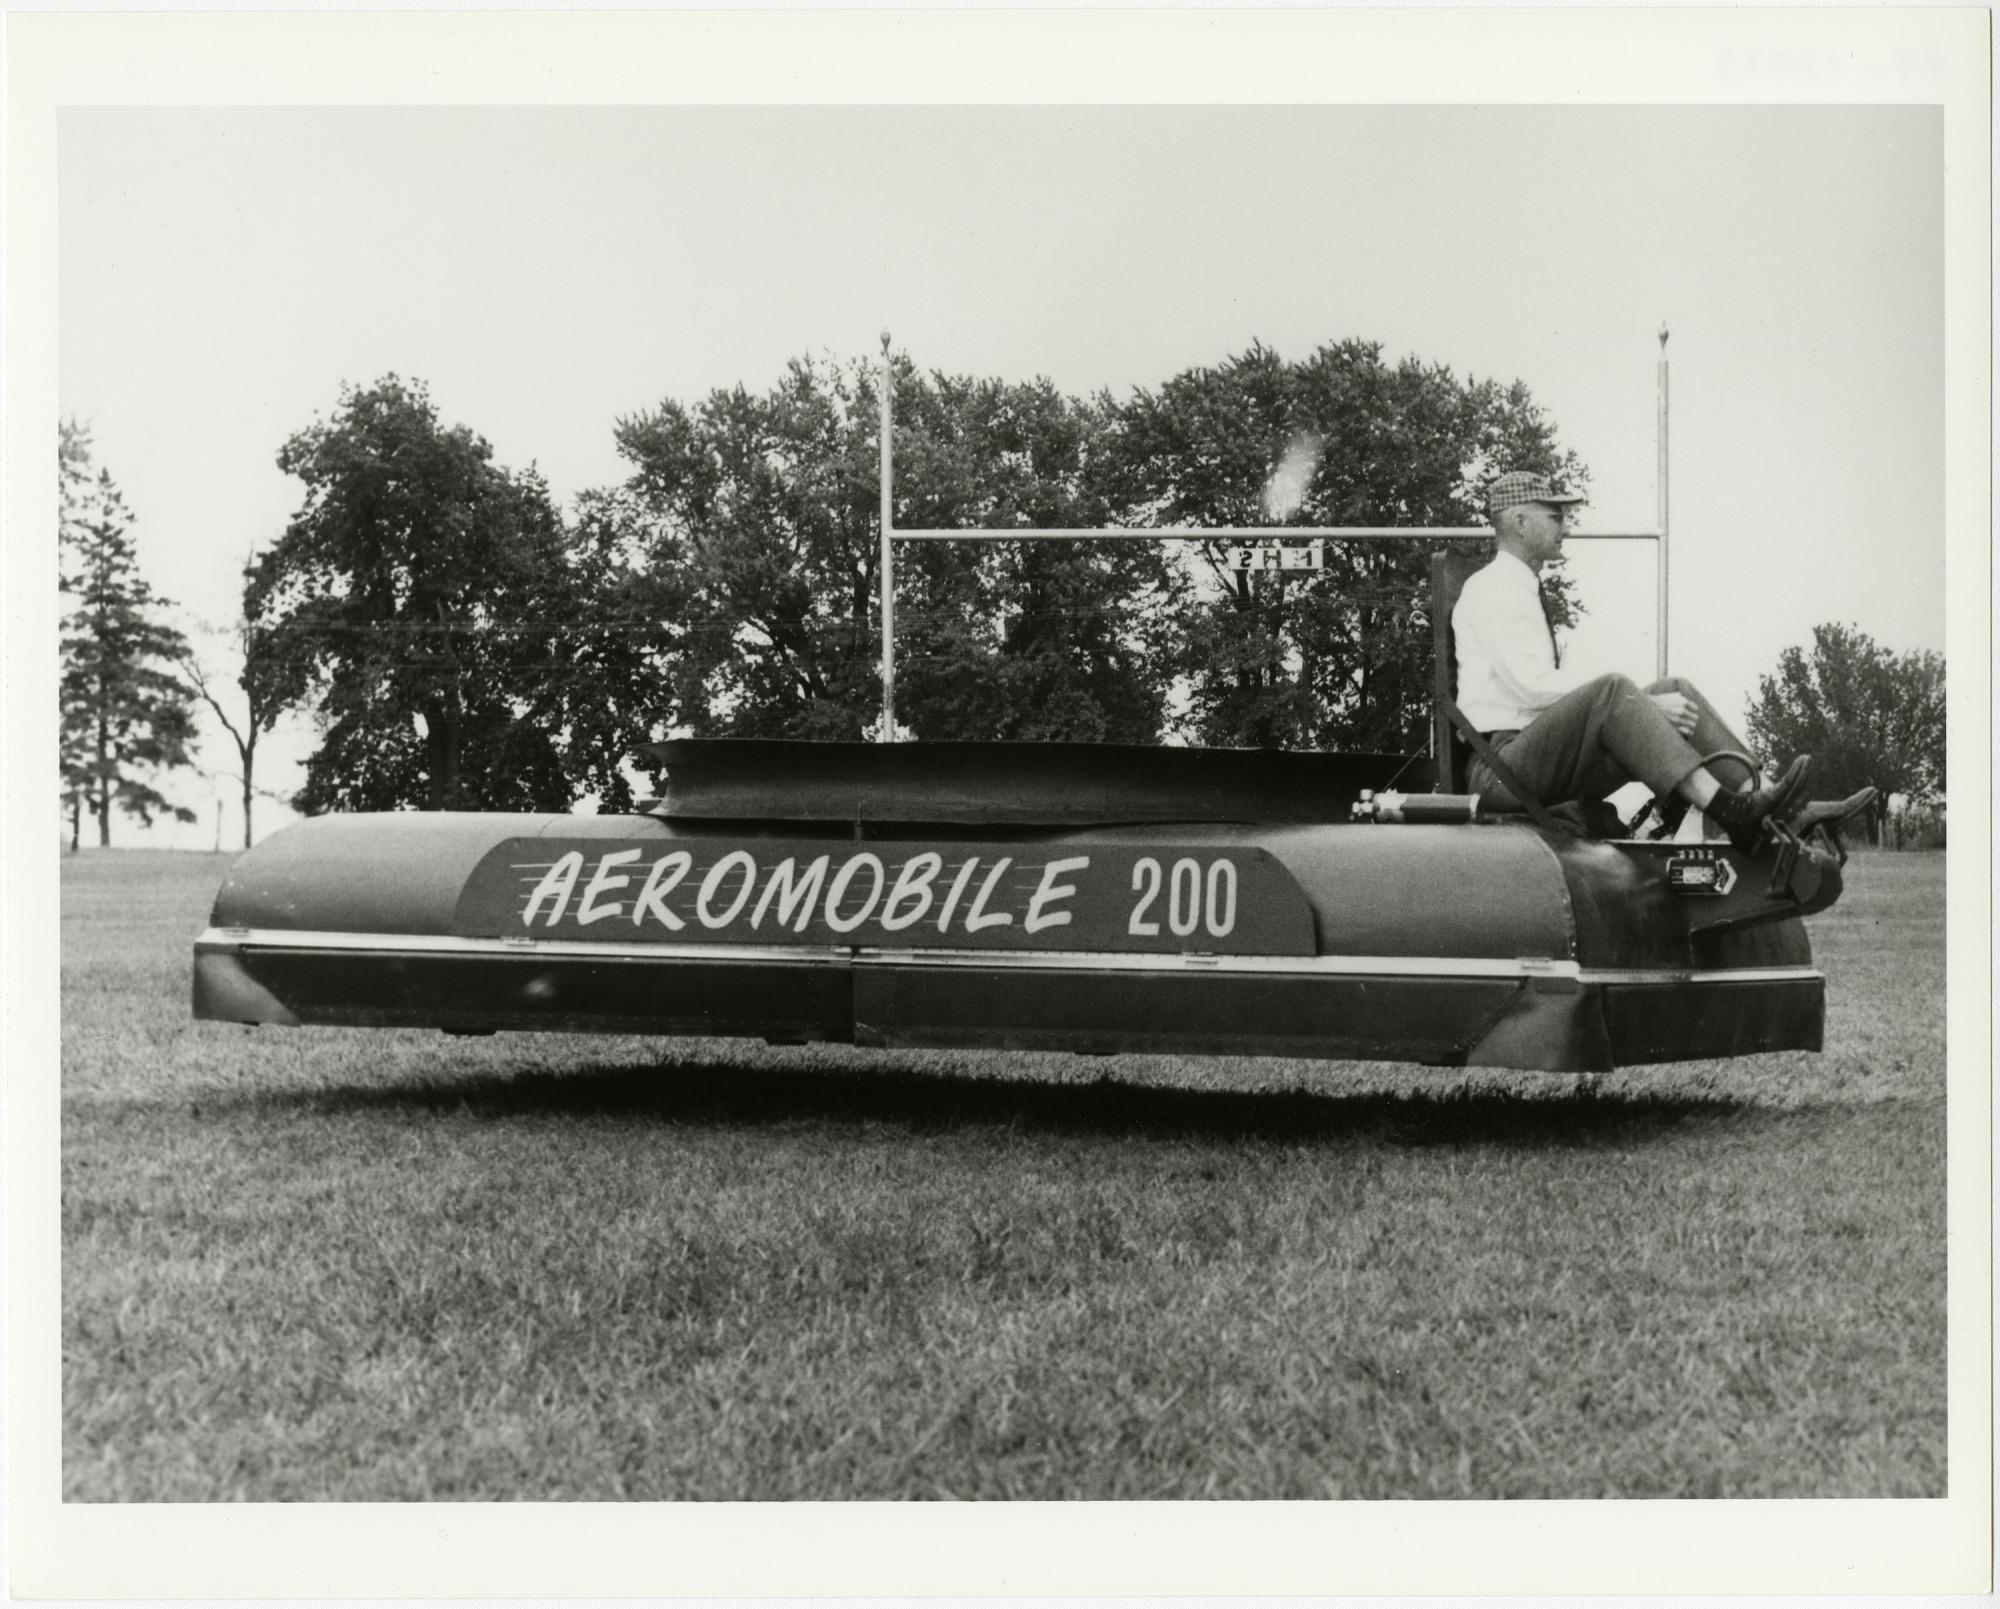 Air Cushion Vehicles Bertelsen Collection